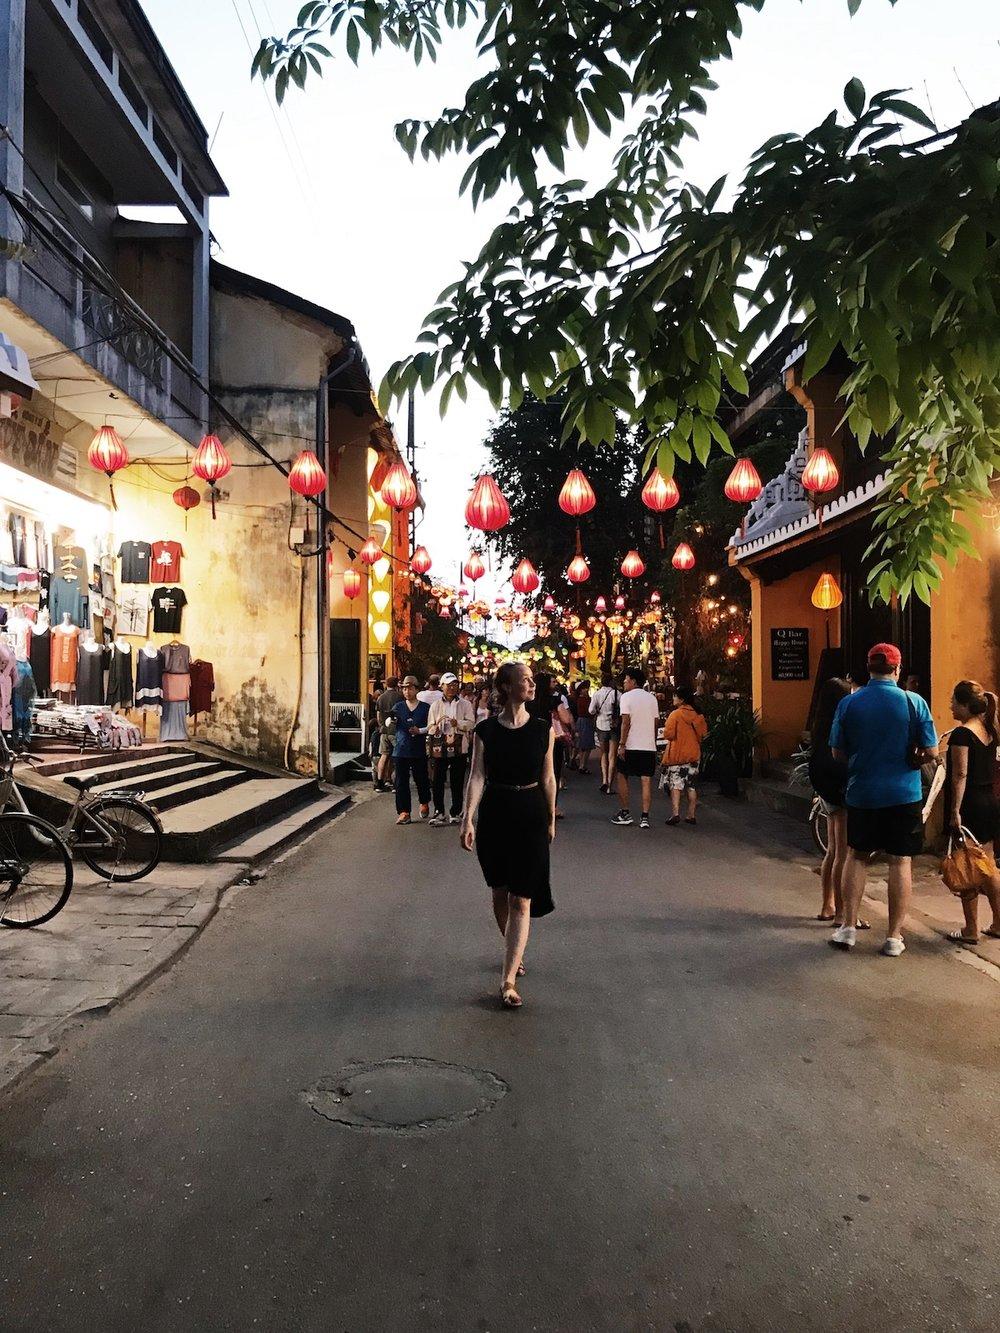 Hoi An Old City, Vietnam Travel Diary | Ruby Josephine